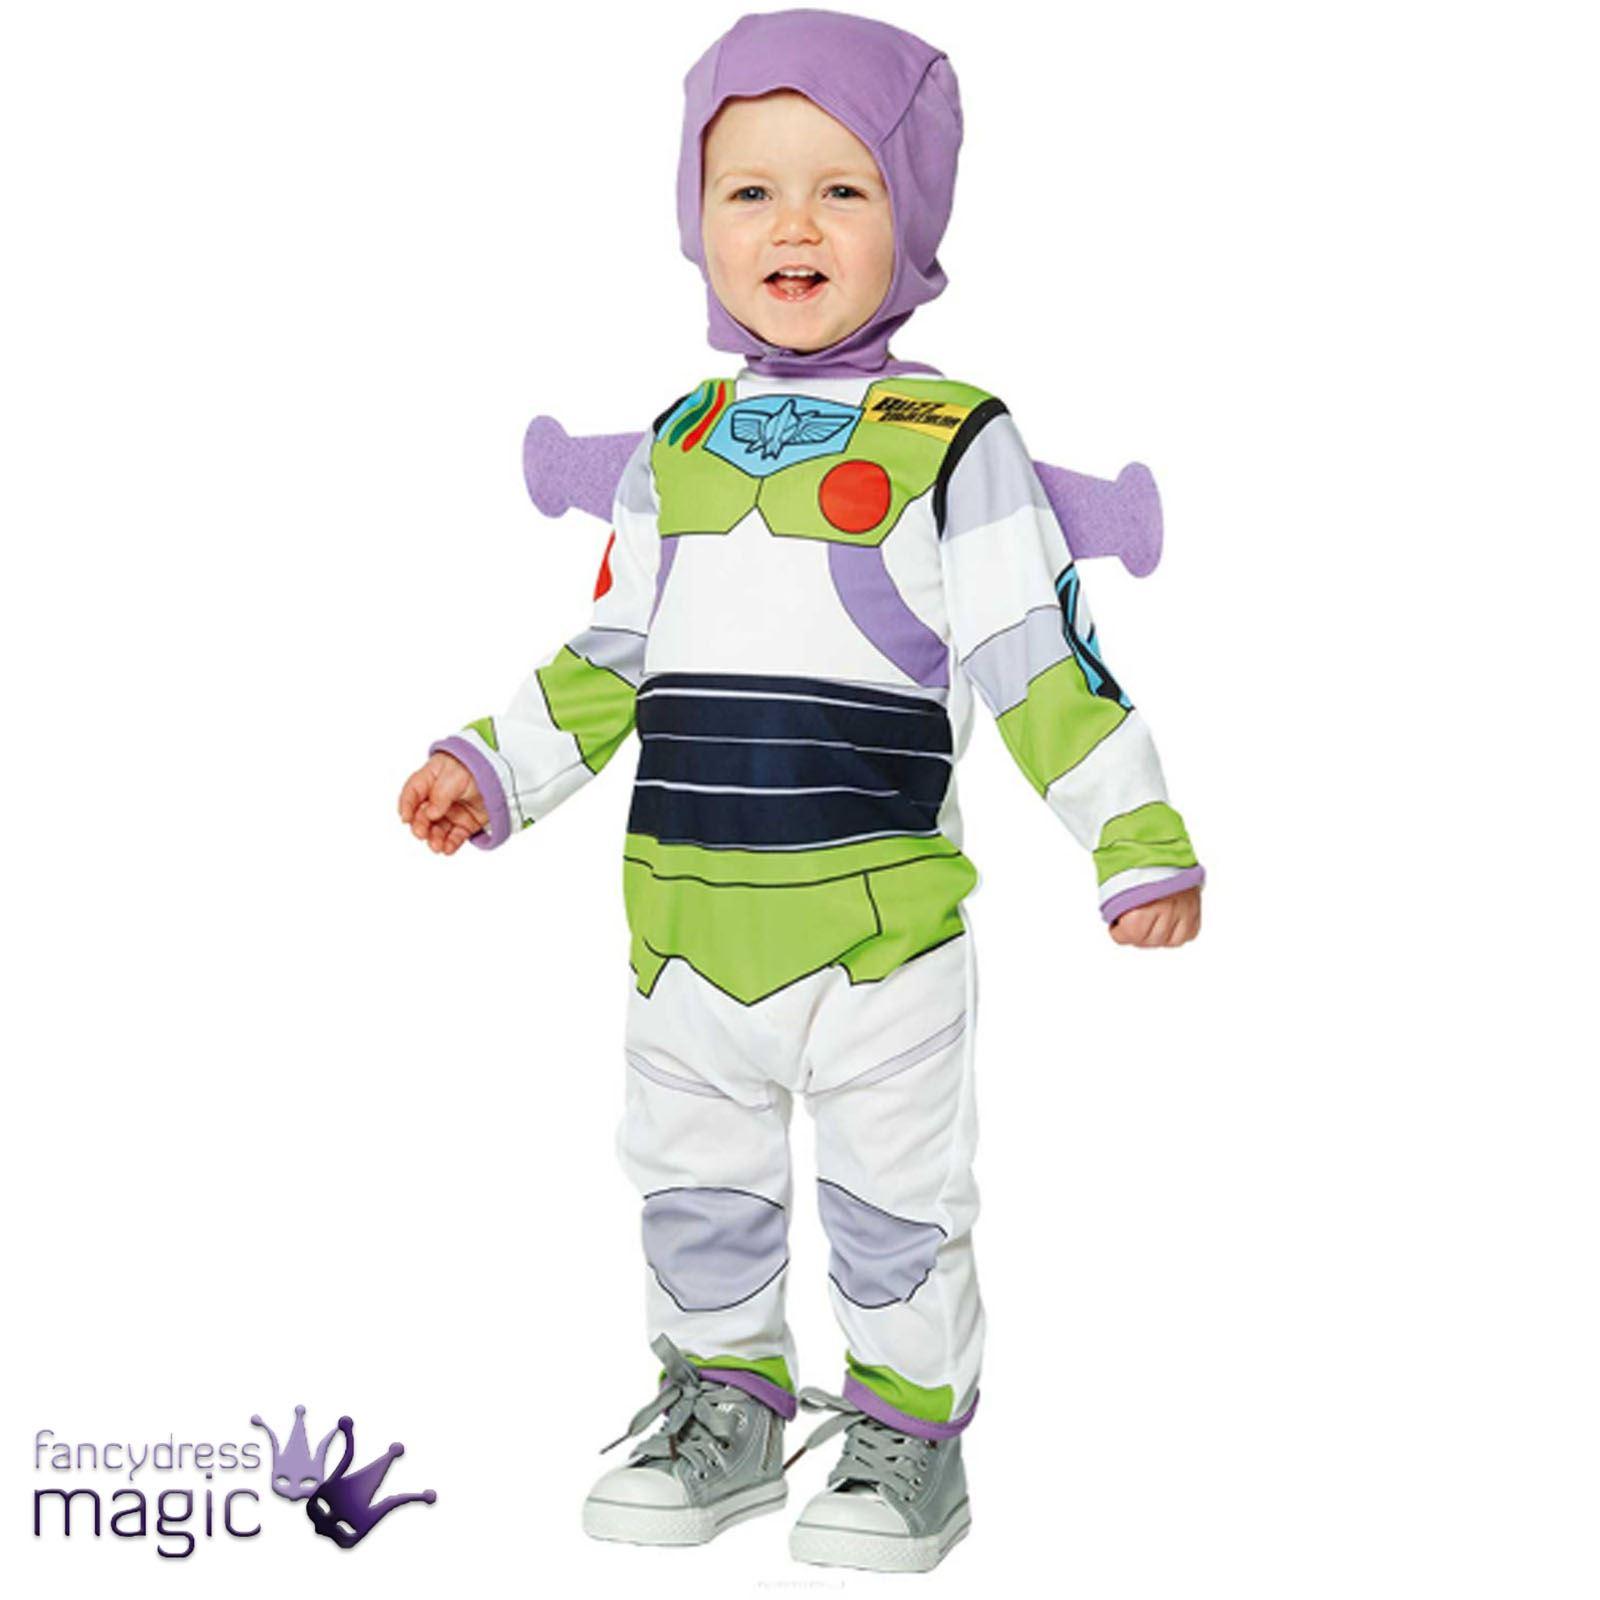 Disney Toys For Boys : Childs toddler boys girls disney toy story movie book week